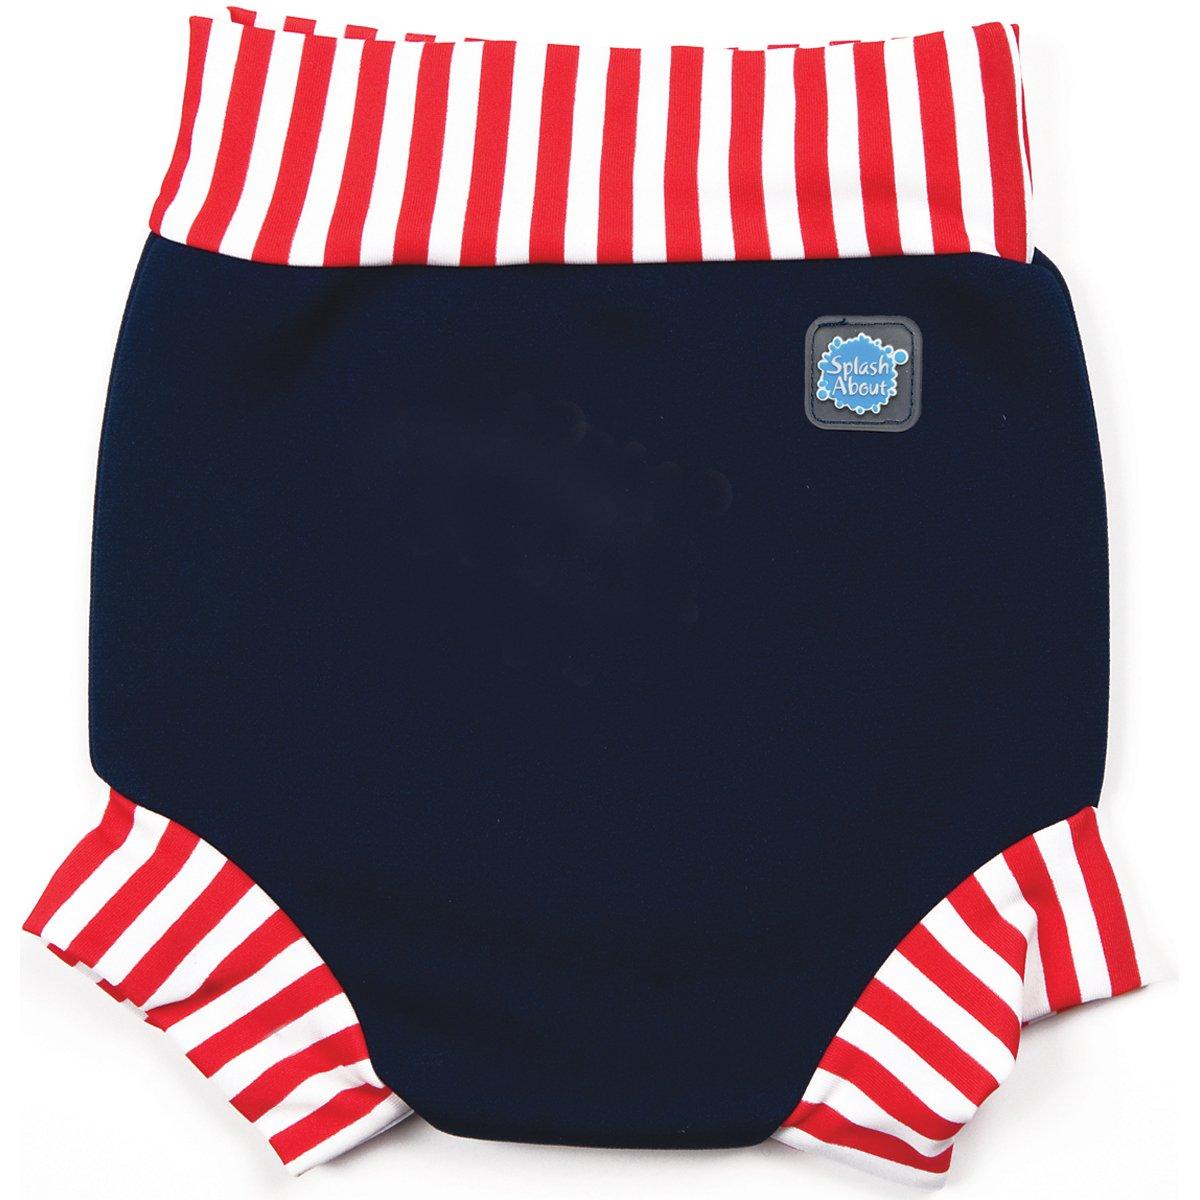 Splash About Kids' Reusable Swim Happy Nappy